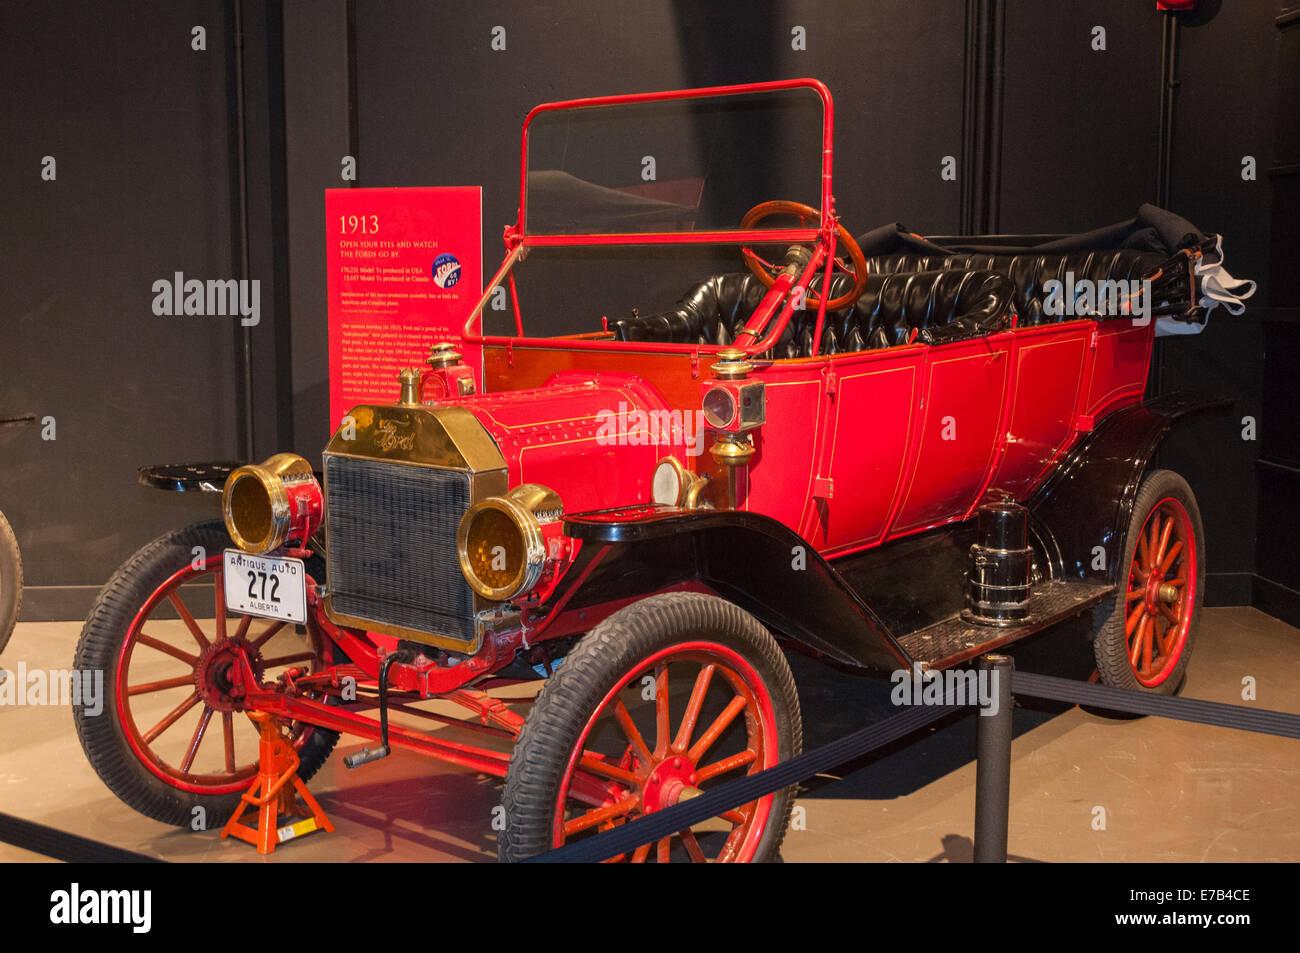 Elk203-5686 Canada, Alberta, Wetaskiwin, Reynolds-Alberta Museum, vintage automobile - Stock Image